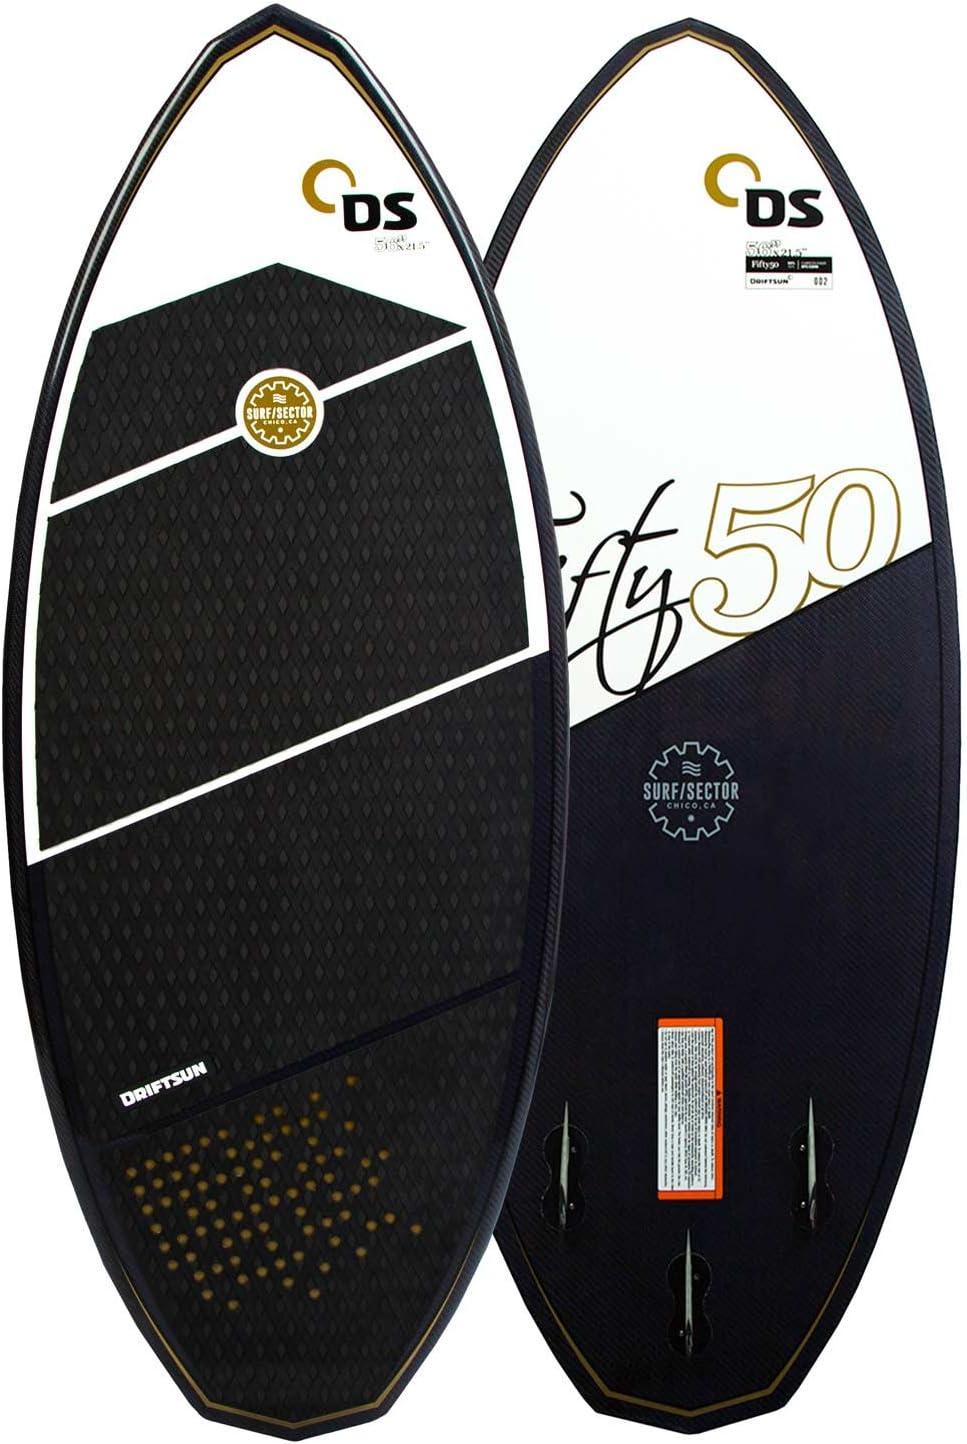 Driftsun Fifty-50 Wakesurf Planche de réveil Motif Skim sur Mesure 10,2 m 22,9 cm